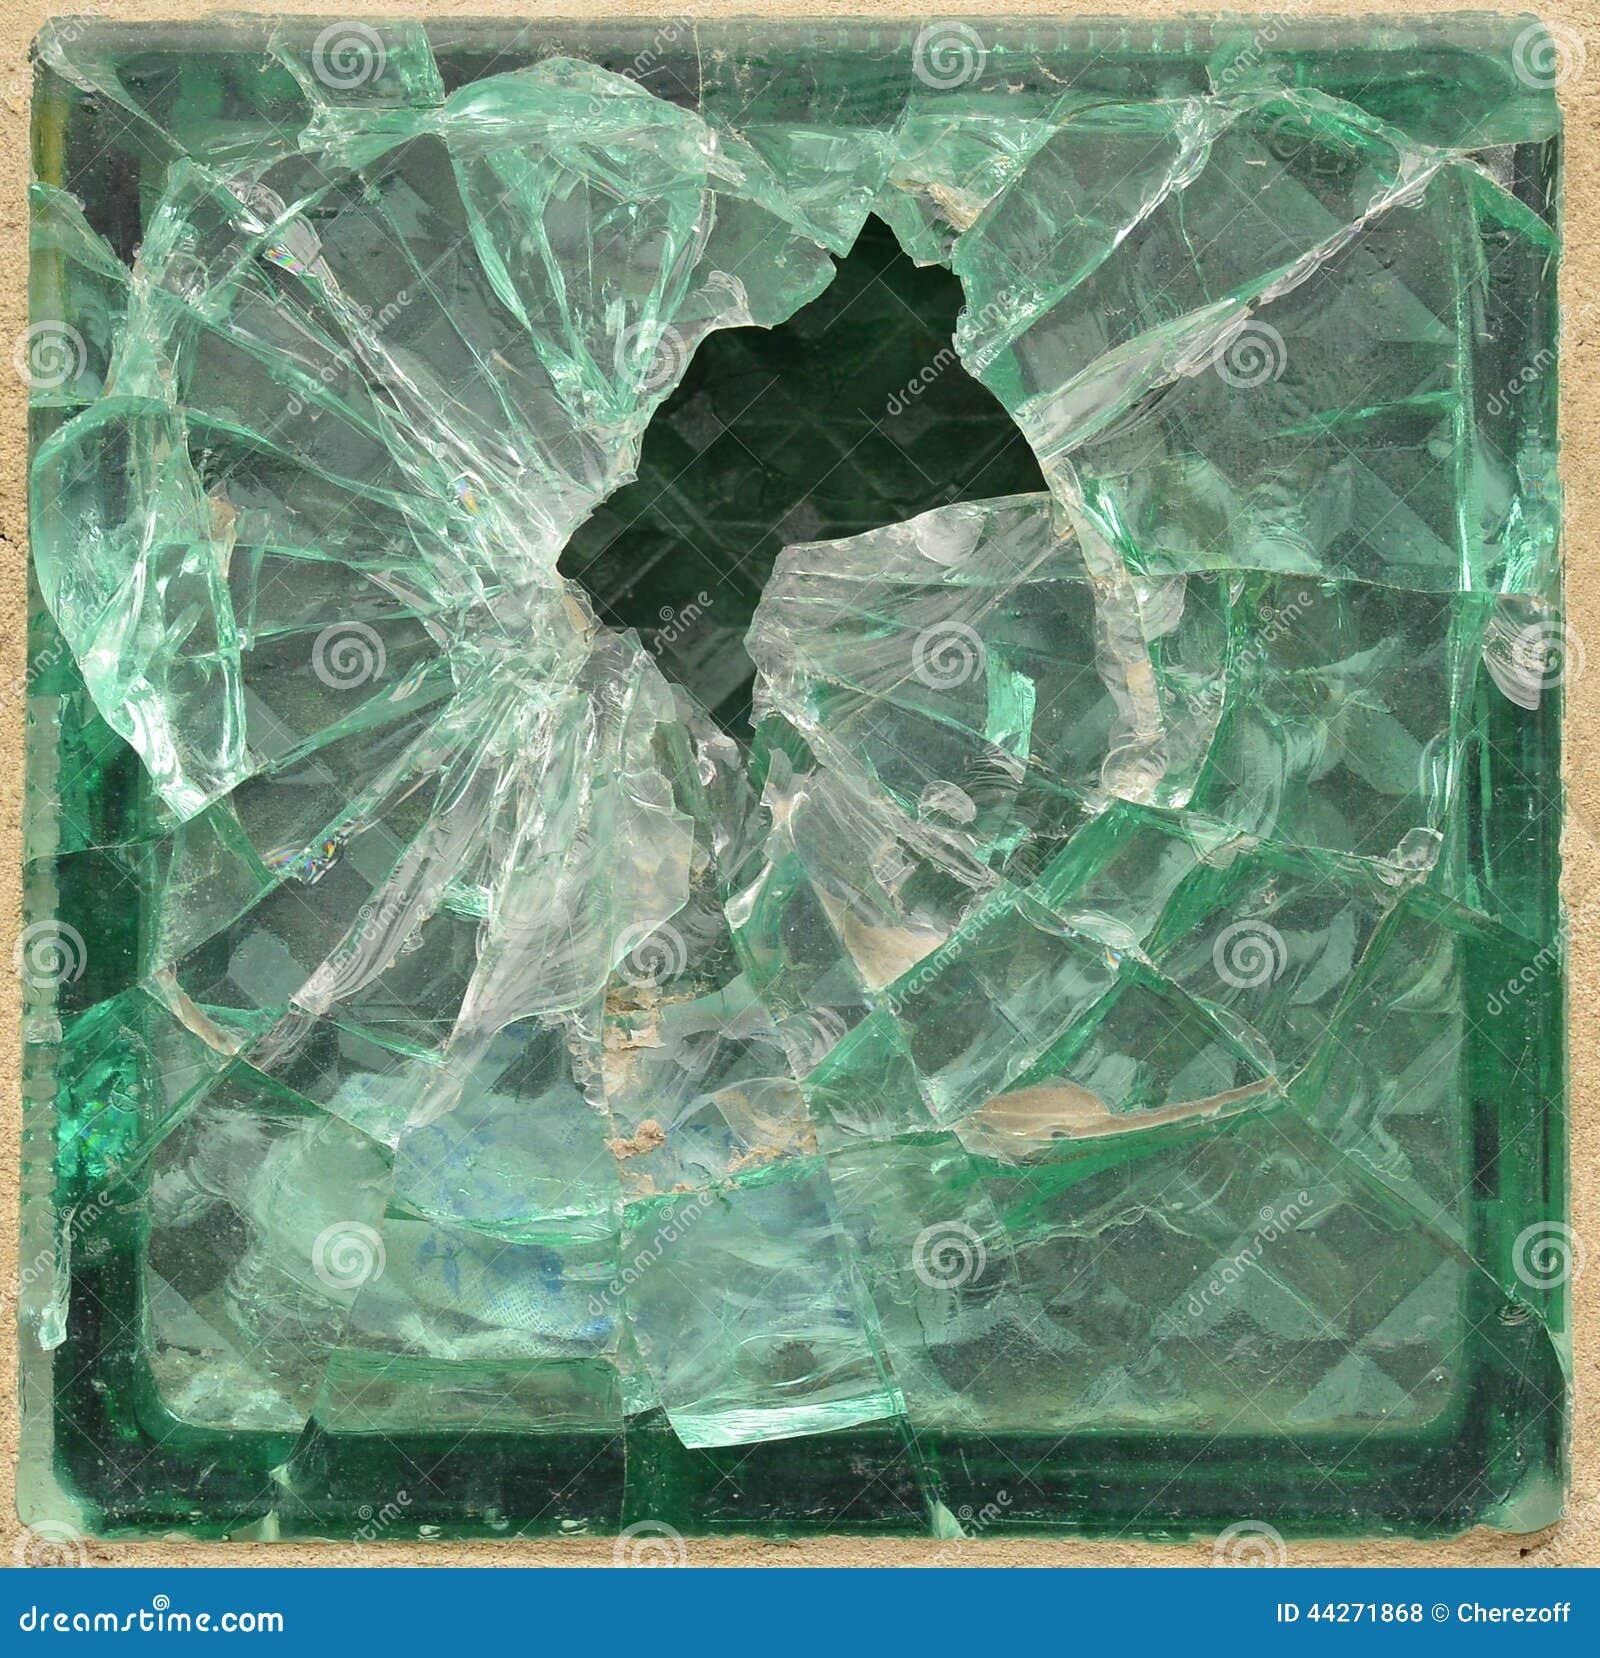 Ladrillo de cristal roto foto de archivo imagen 44271868 - Ladrillo de cristal ...